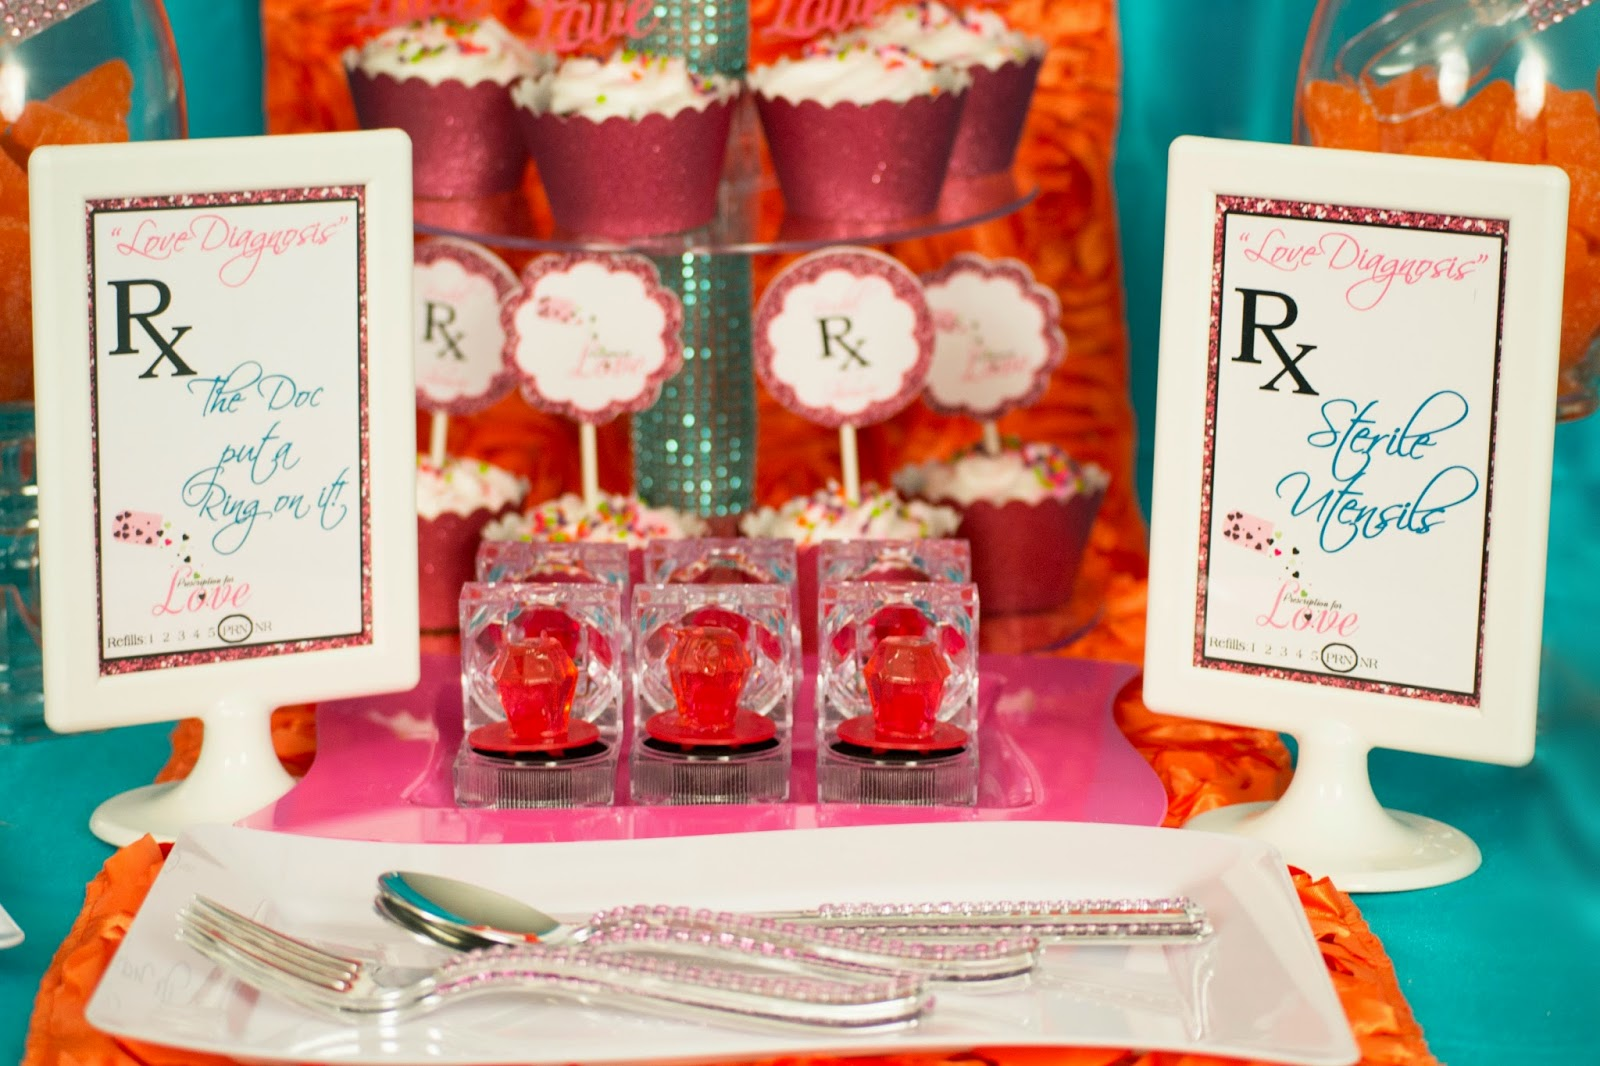 Prescription for Love} Bridal Shower - Lavish Events and Prints by Talia